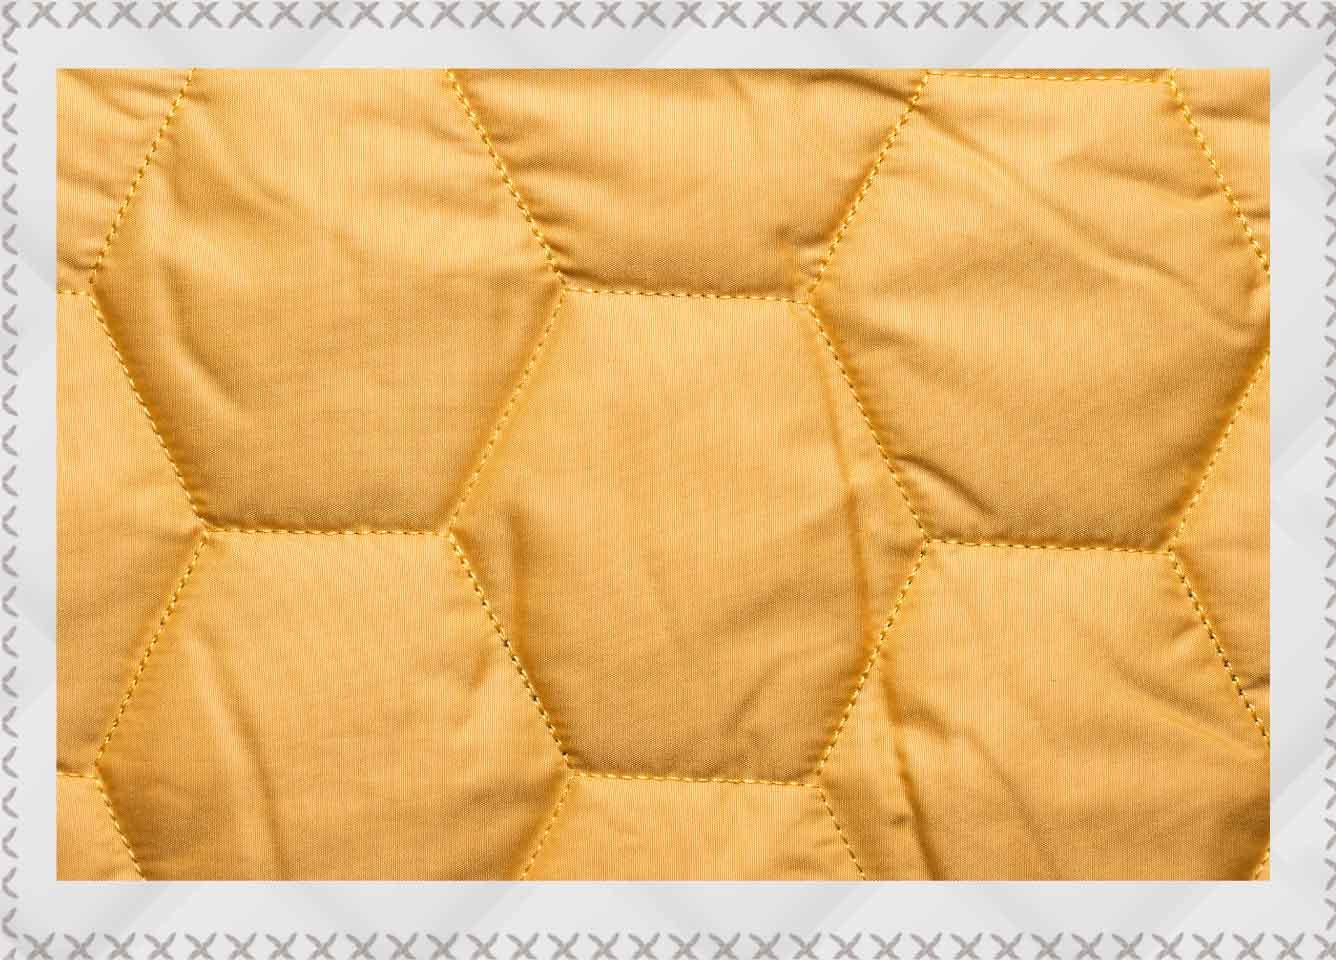 elka-kapitone-giyim-tekstil-sektoru-017